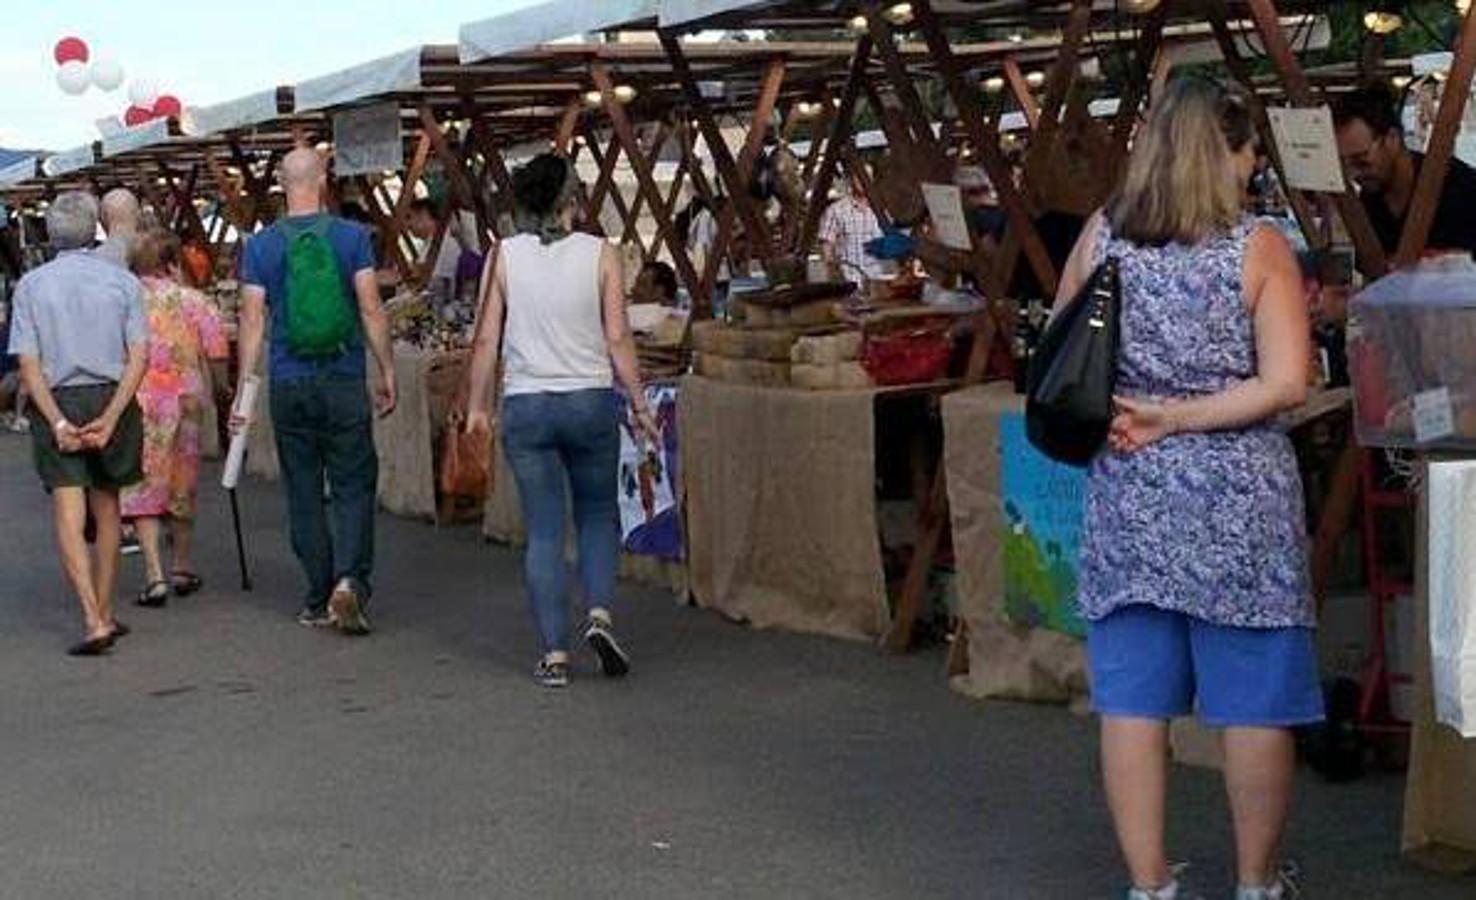 Prato ospita il Mercato del Giubileo